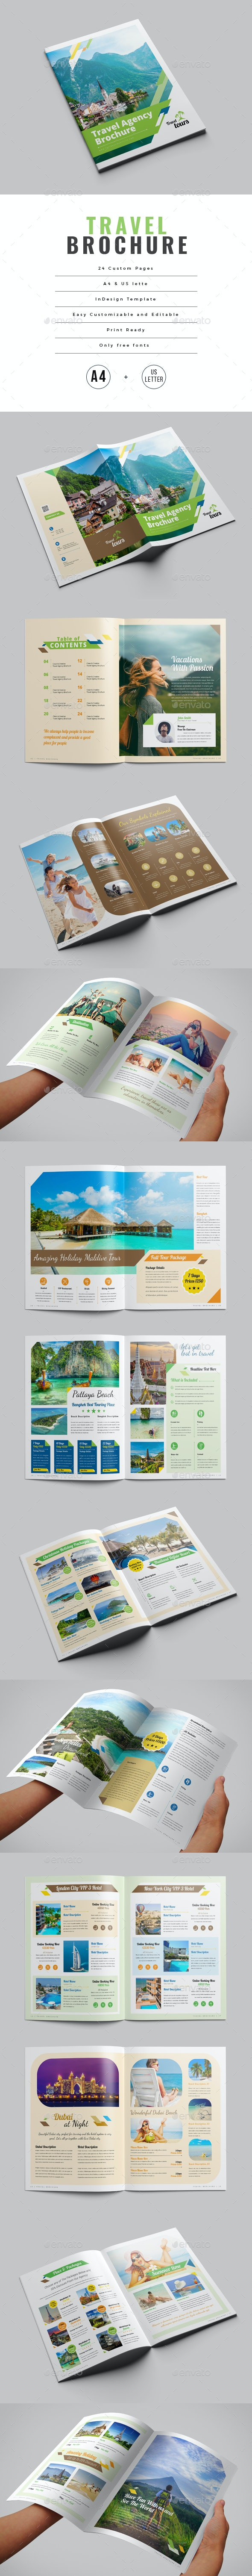 Travel Brochure - Brochures Print Templates